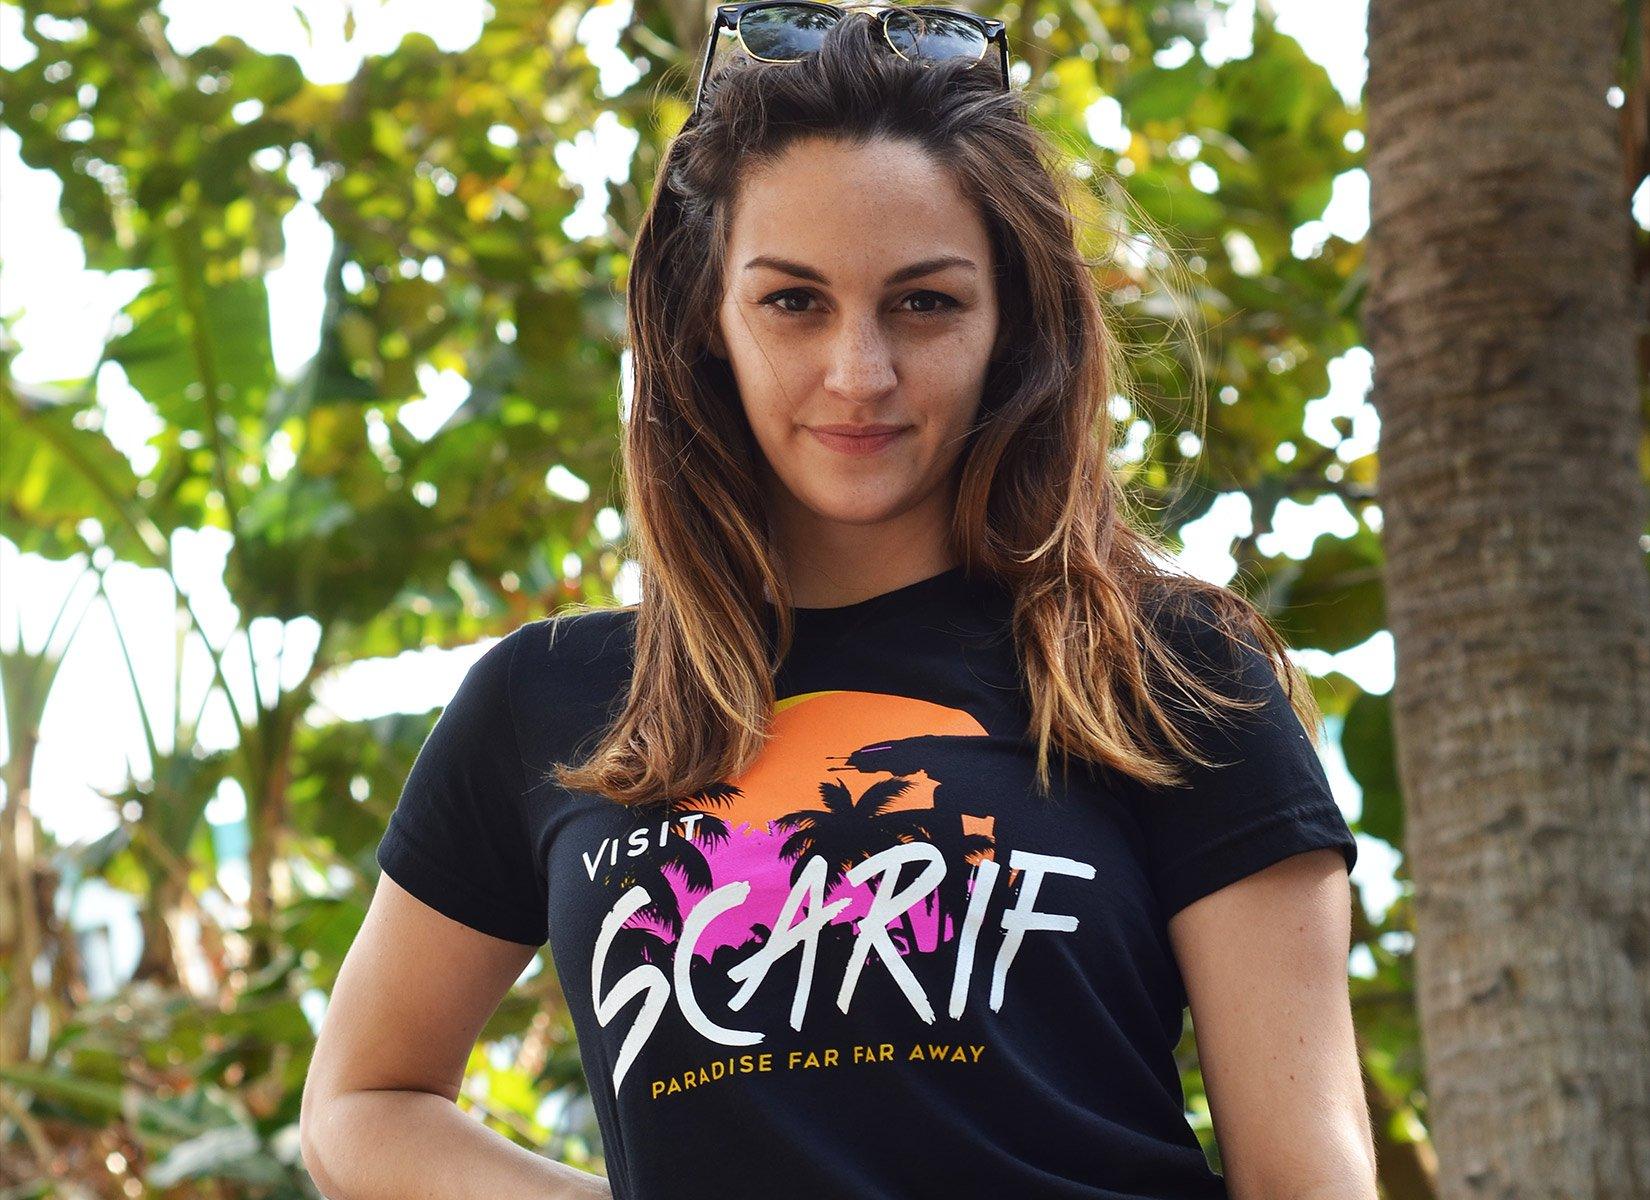 Visit Scarif on Juniors T-Shirt